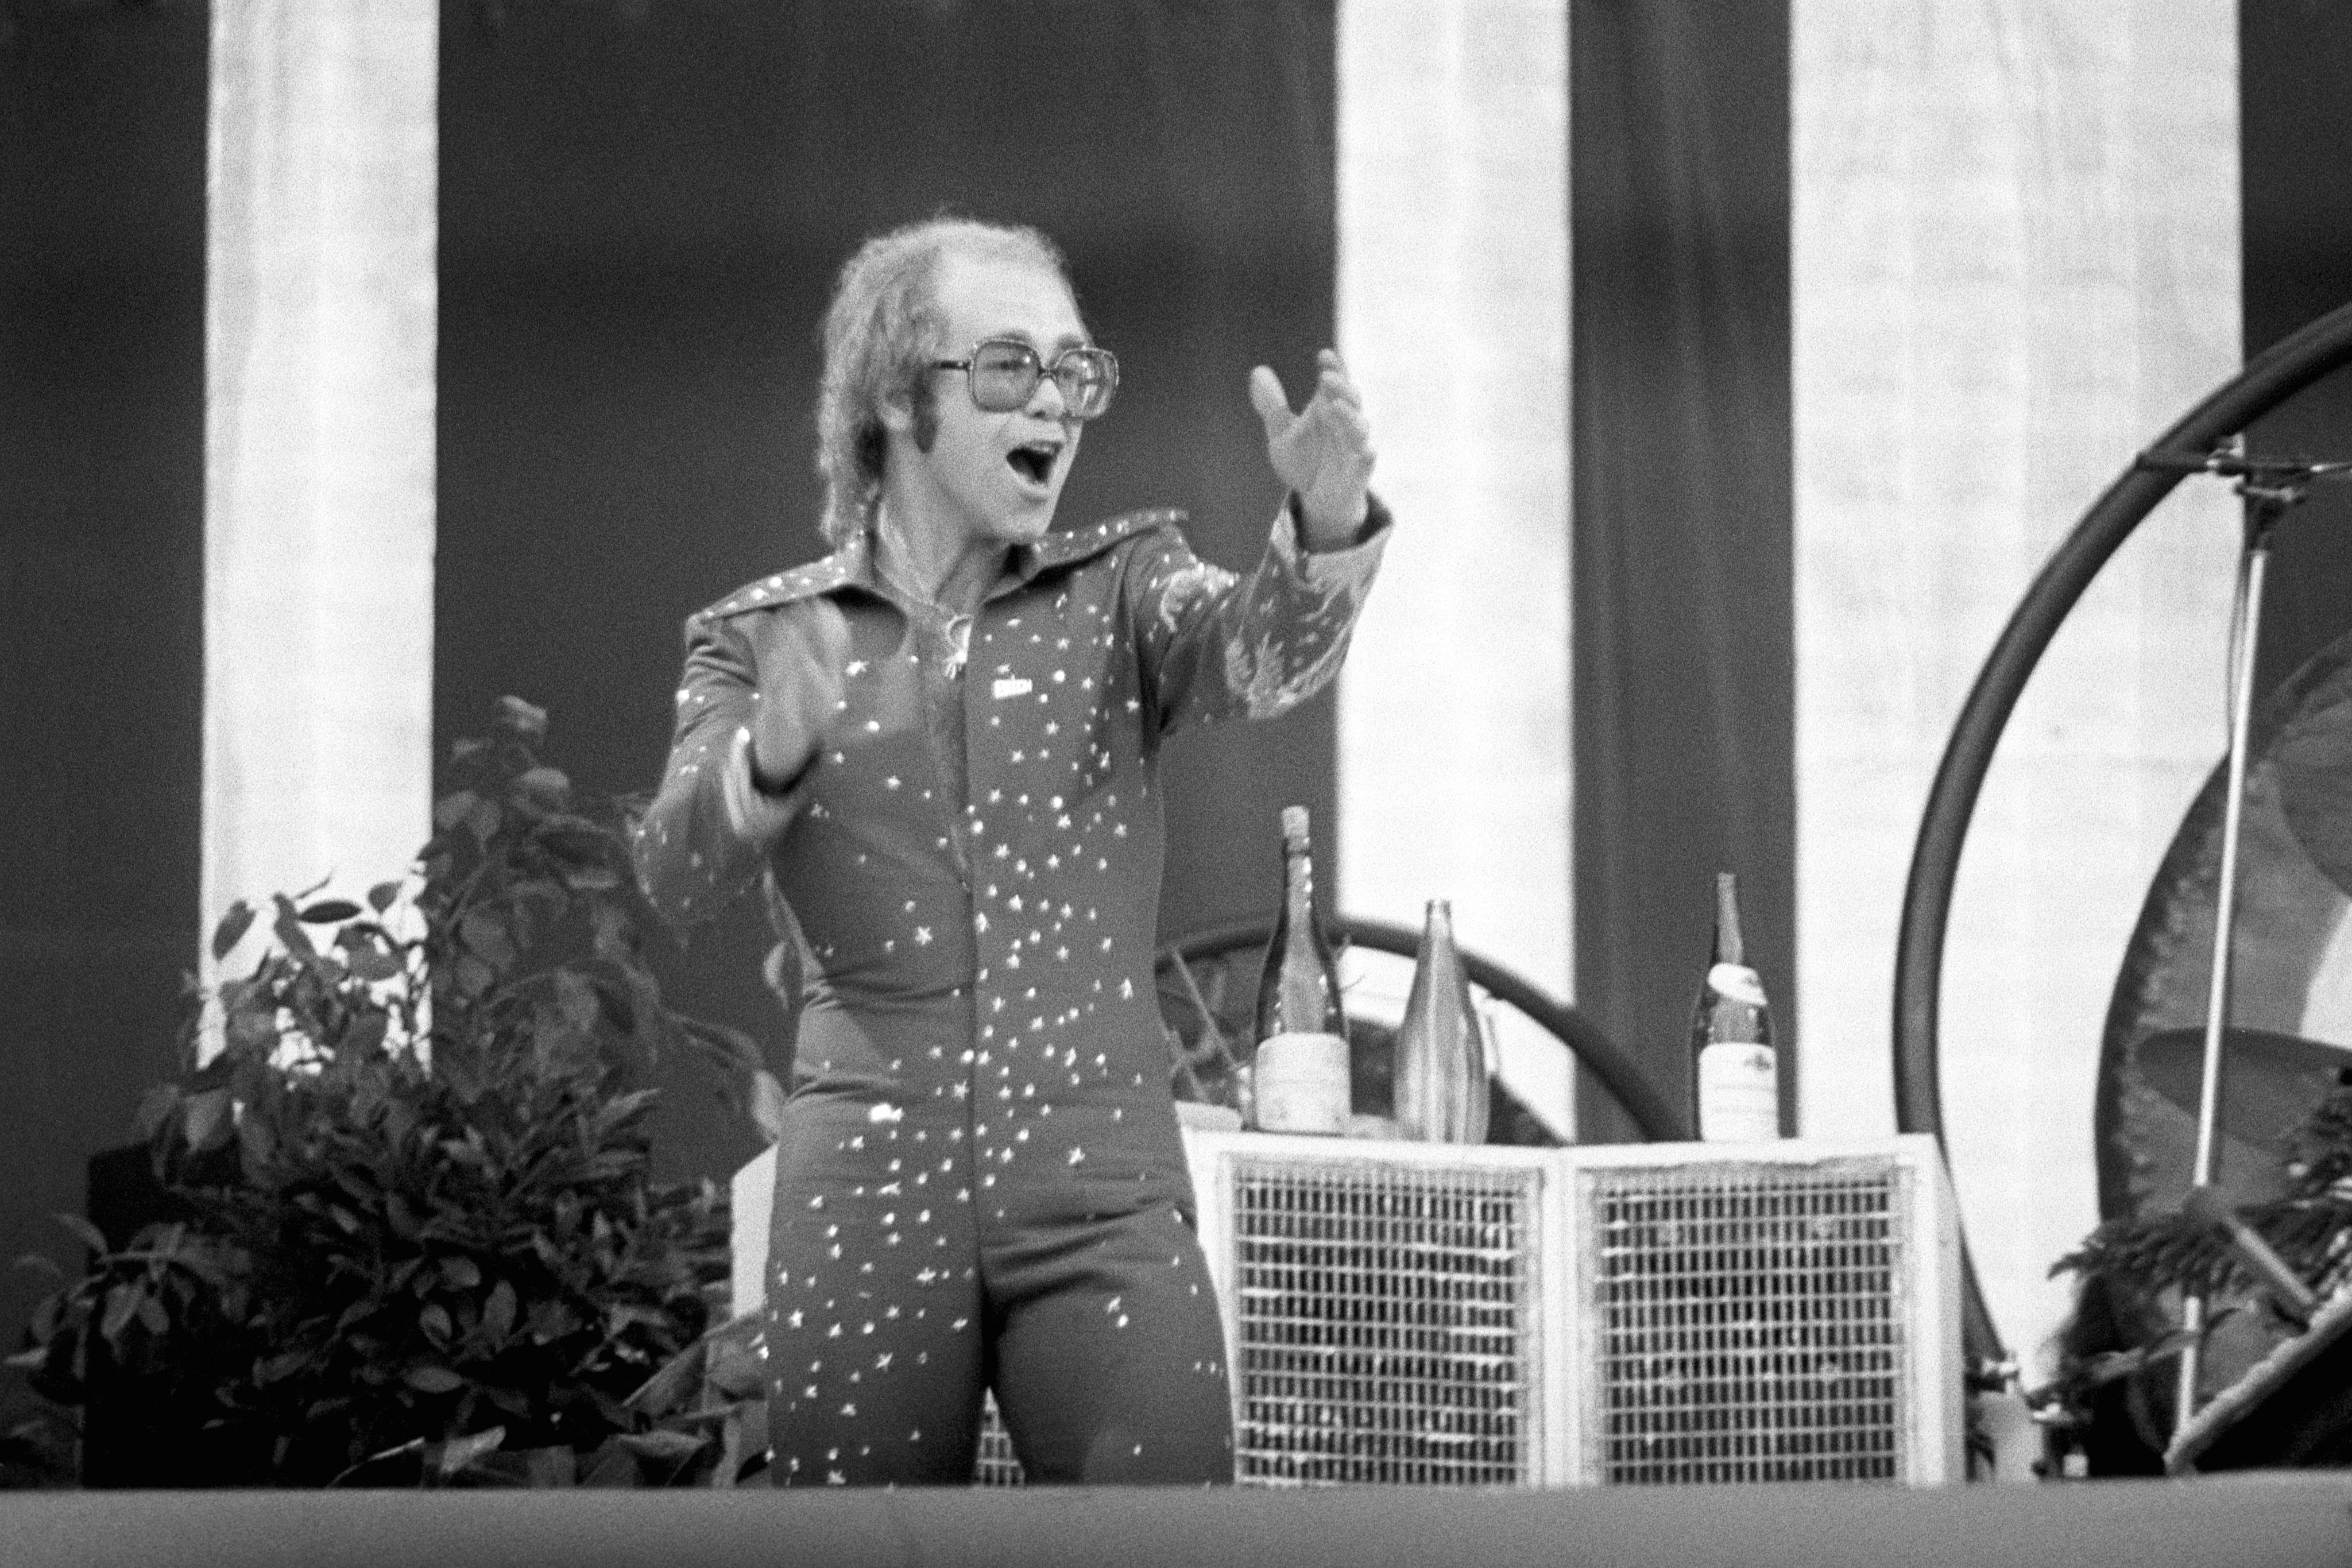 Rock star Elton John performing on stage at Wembley Stadium, Londpn